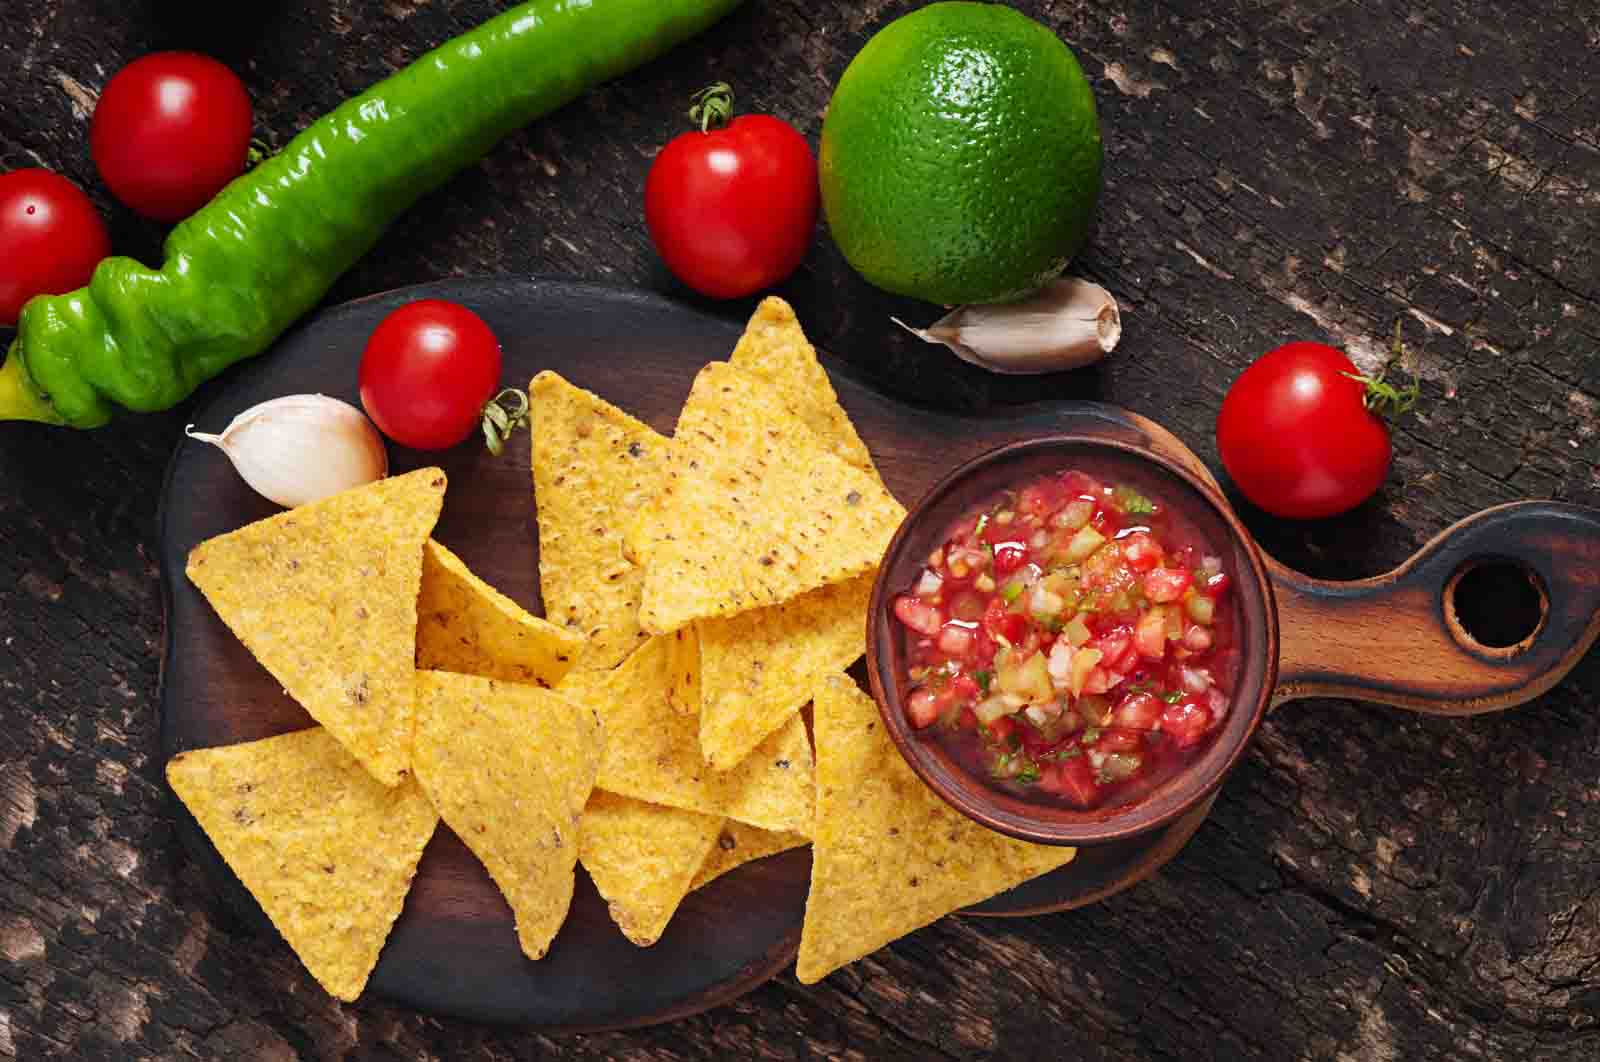 ¿Salsa bandera? ¿Salsa mexicana? ¿Tricolor? ¿Salsa patria?